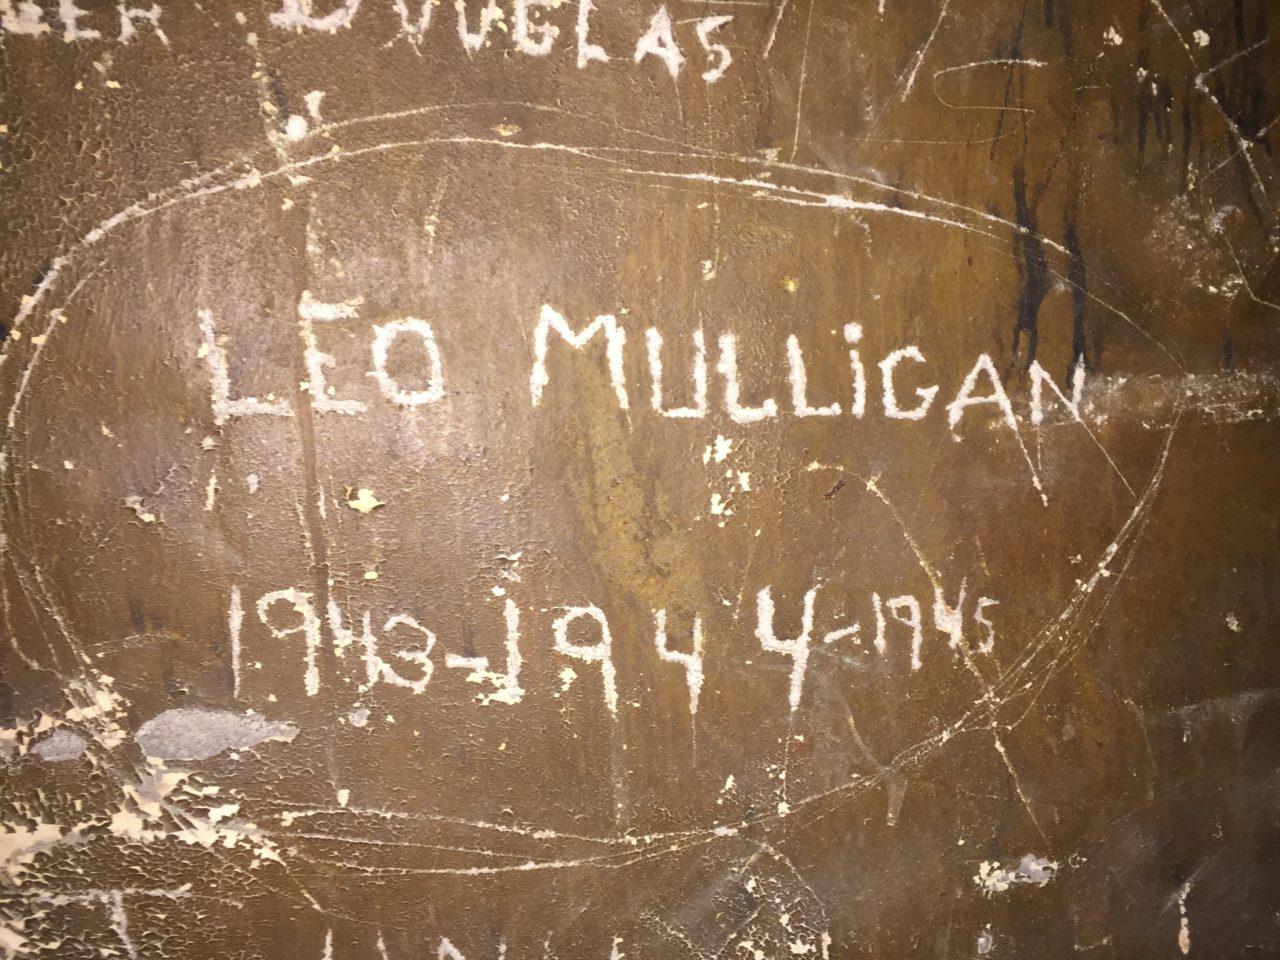 Graffiti from 1940s